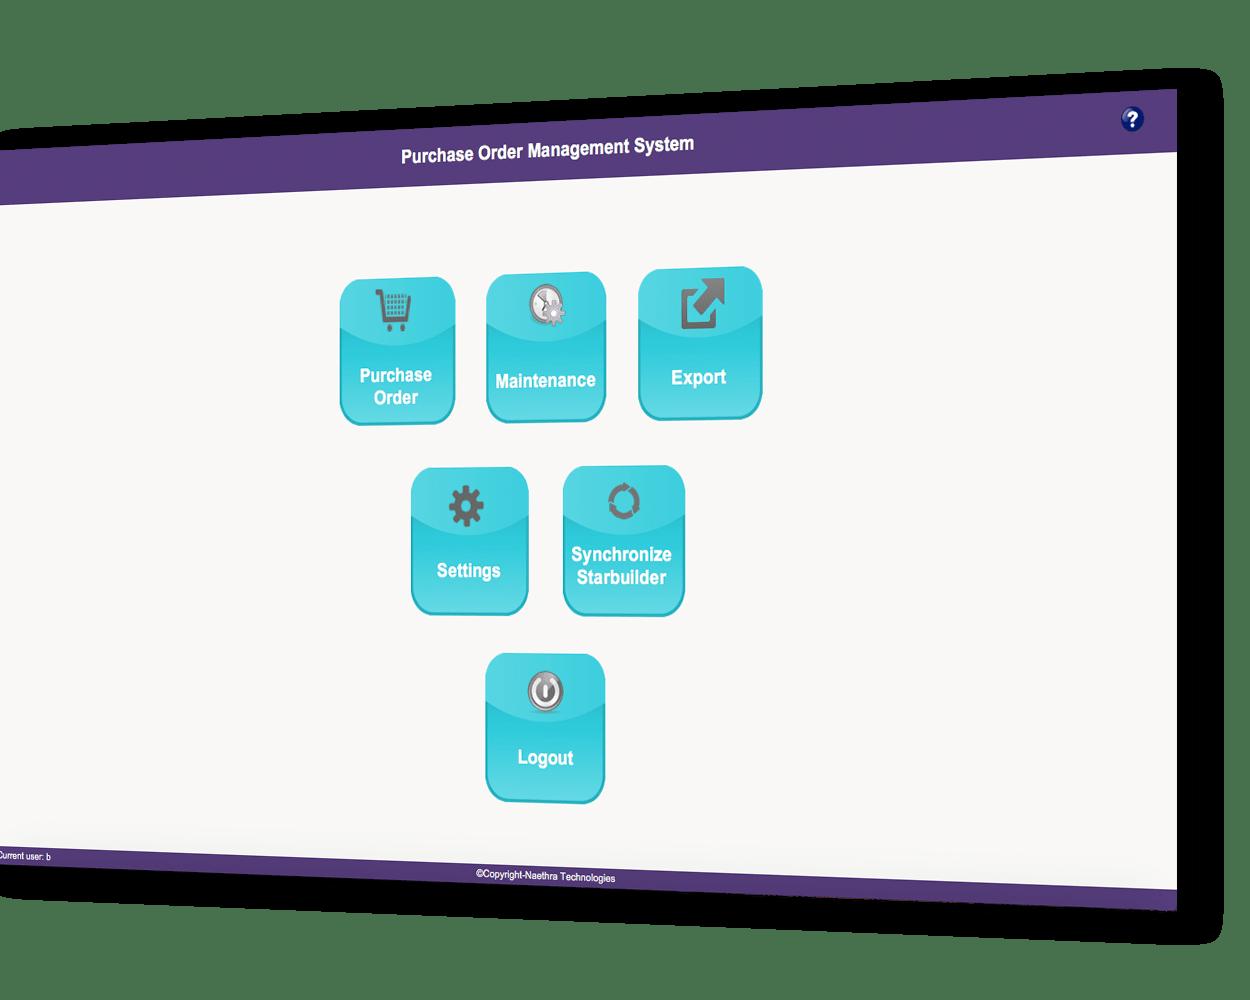 purchase order management system4